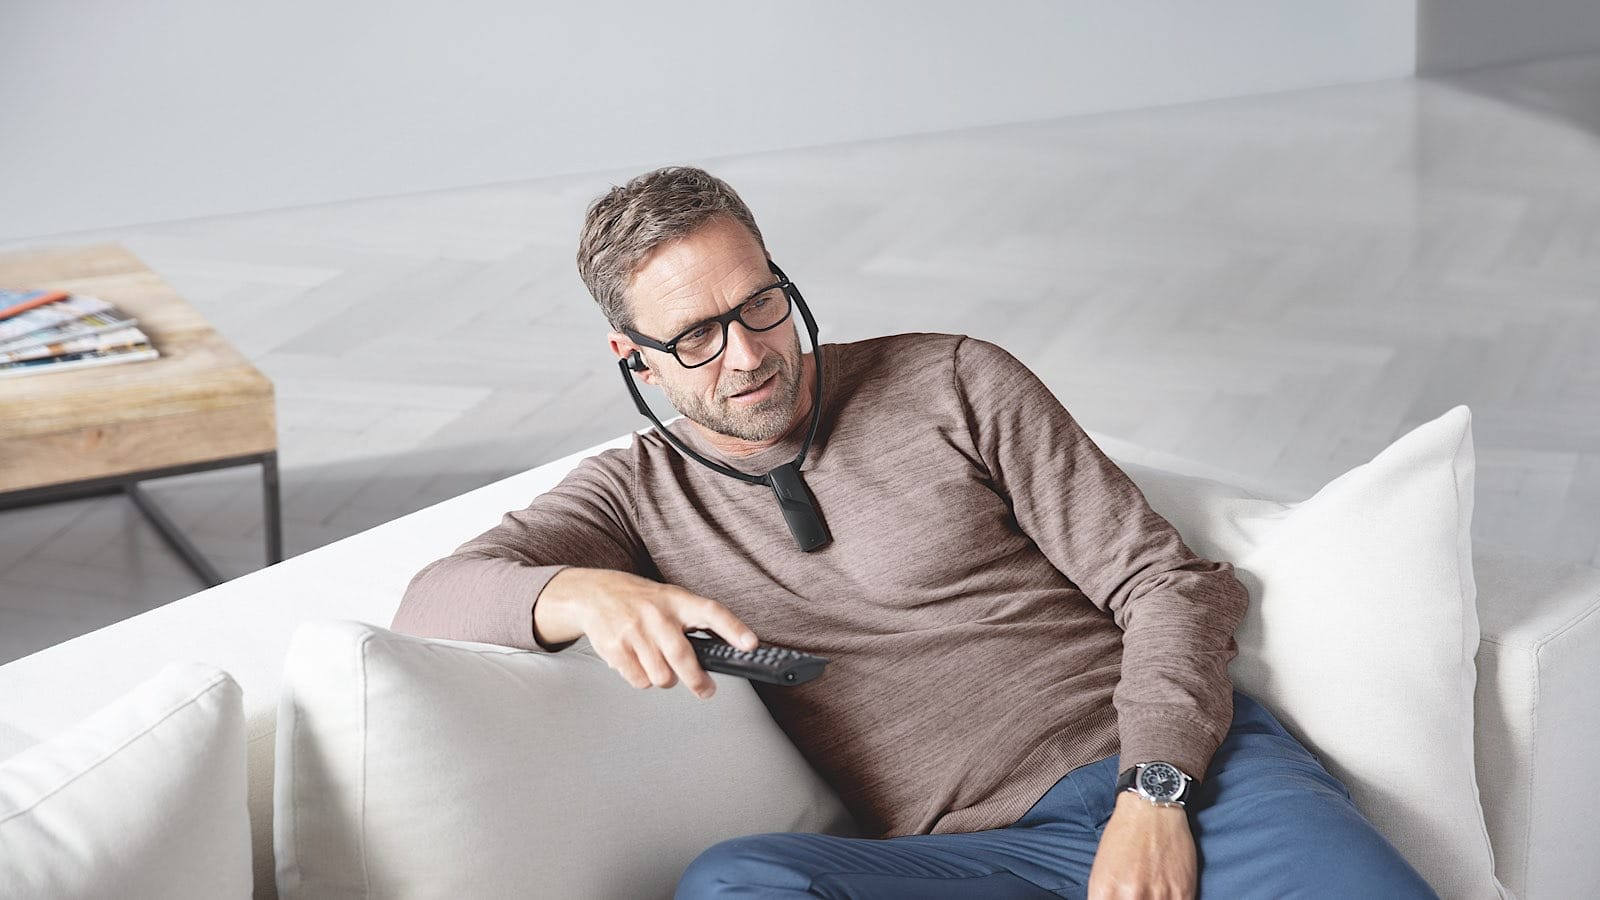 Sennheiser RS 5200 personal earphones for a TV